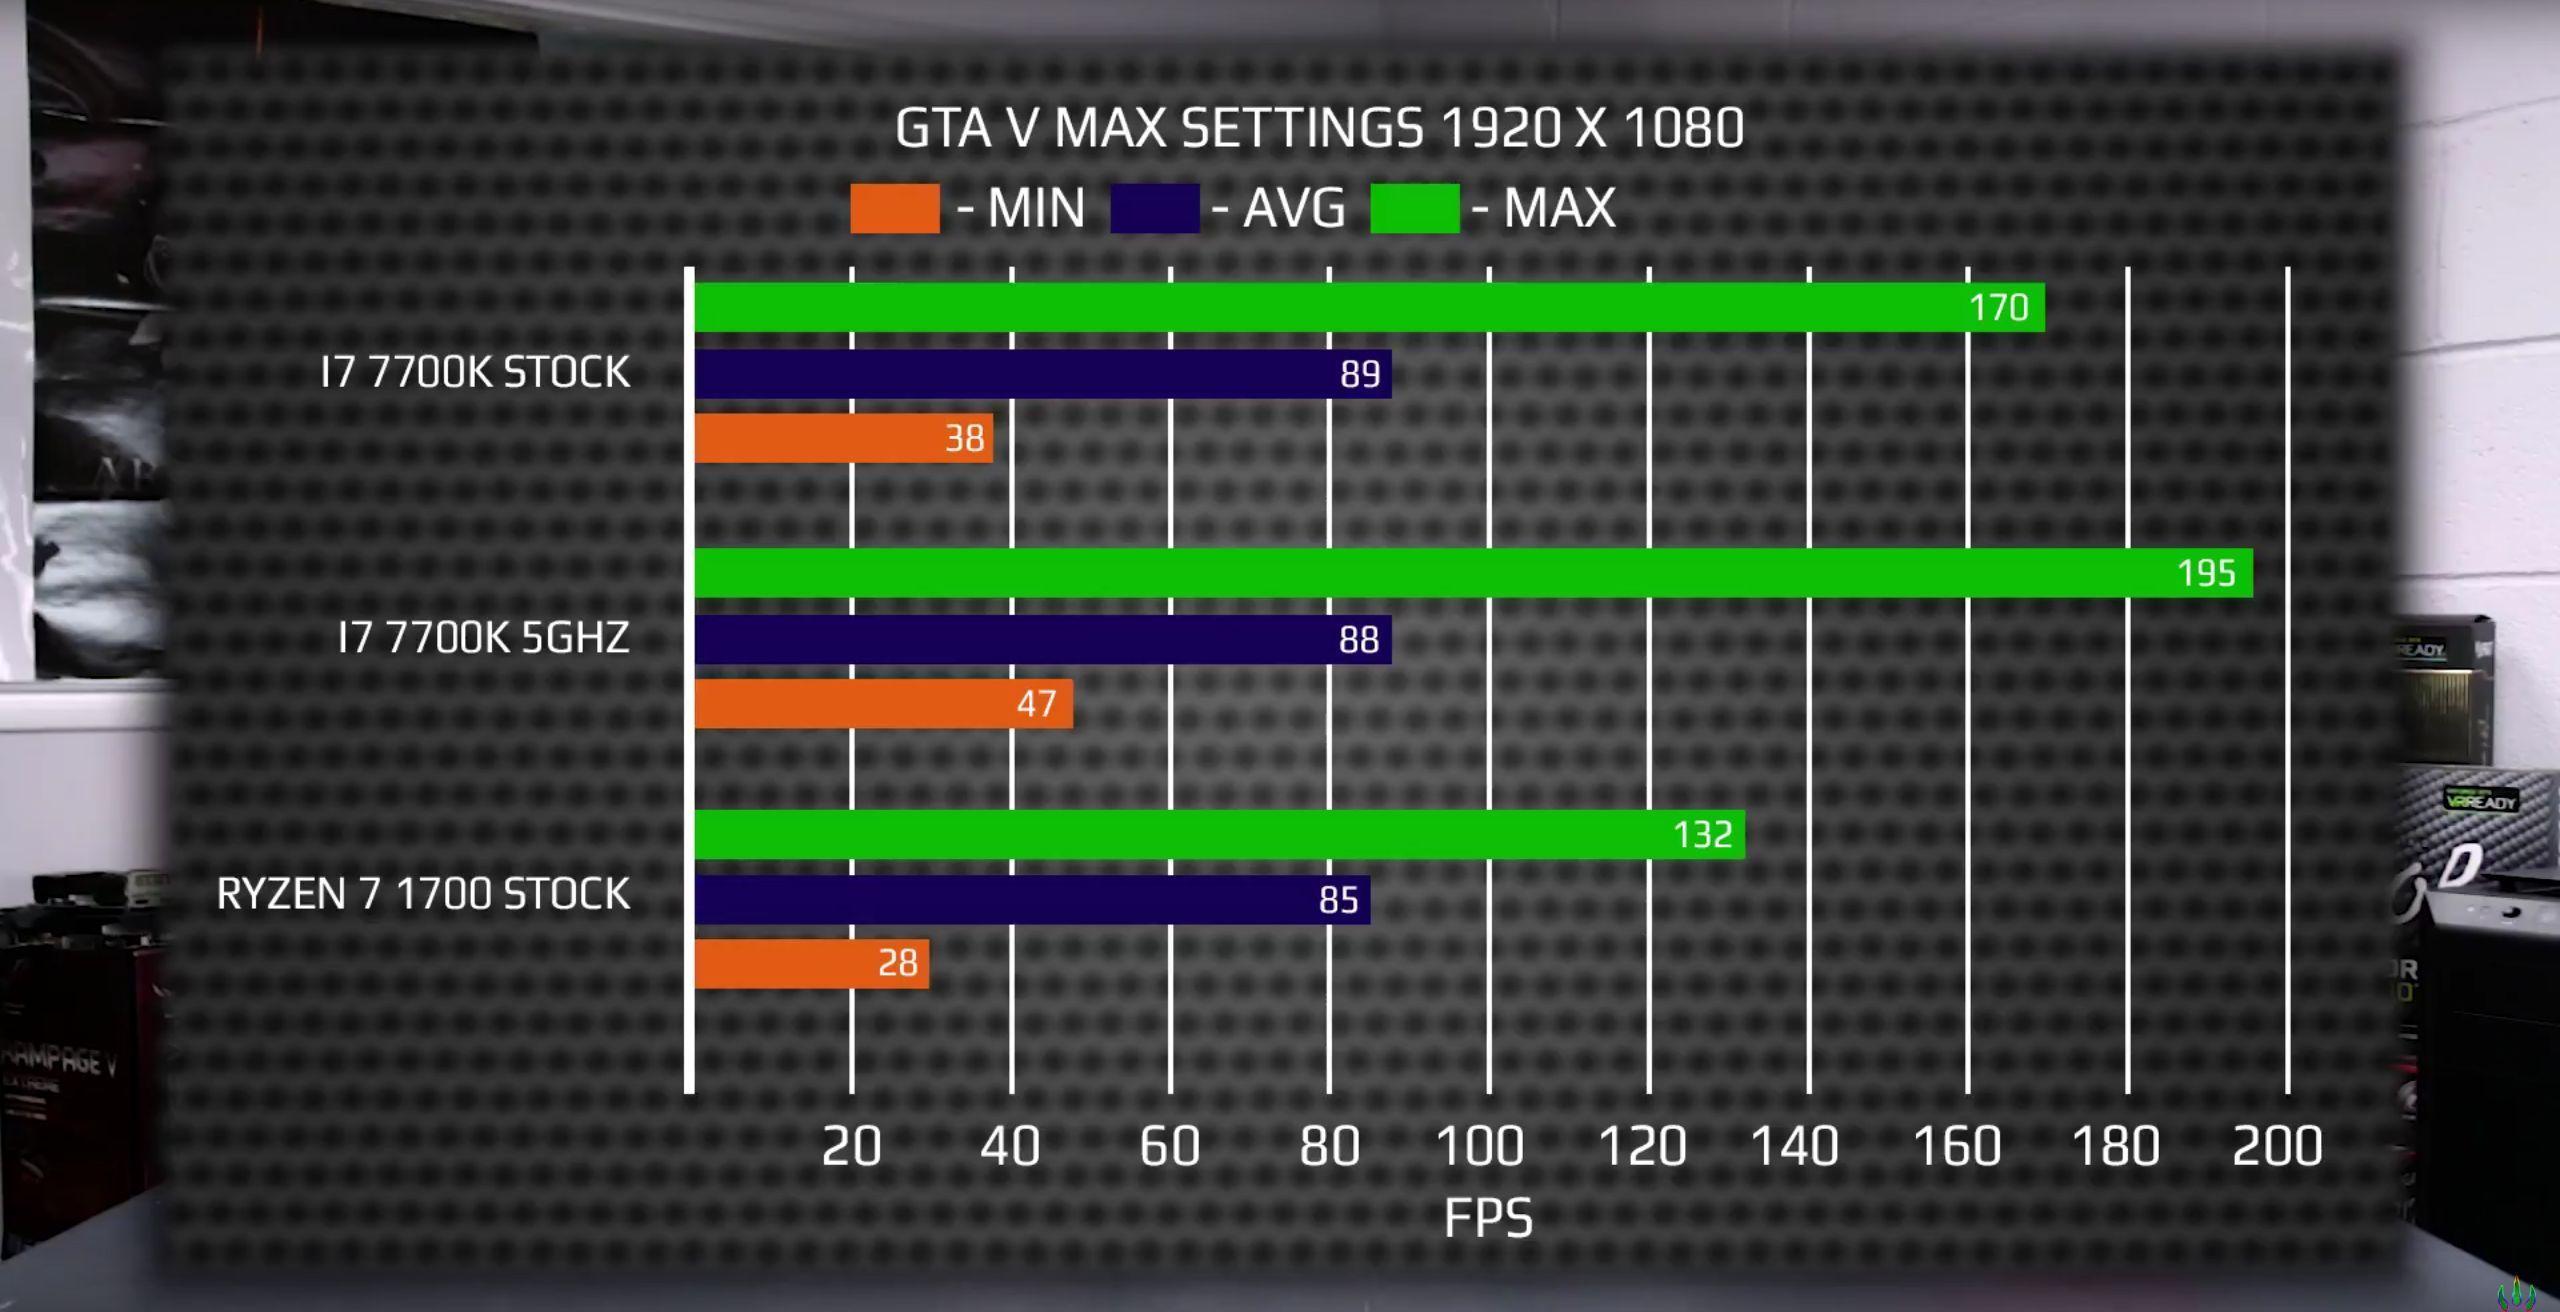 AMD-Ryzen-7-1700-vs-Core-i7-7700K-DinoPC_GTA-V